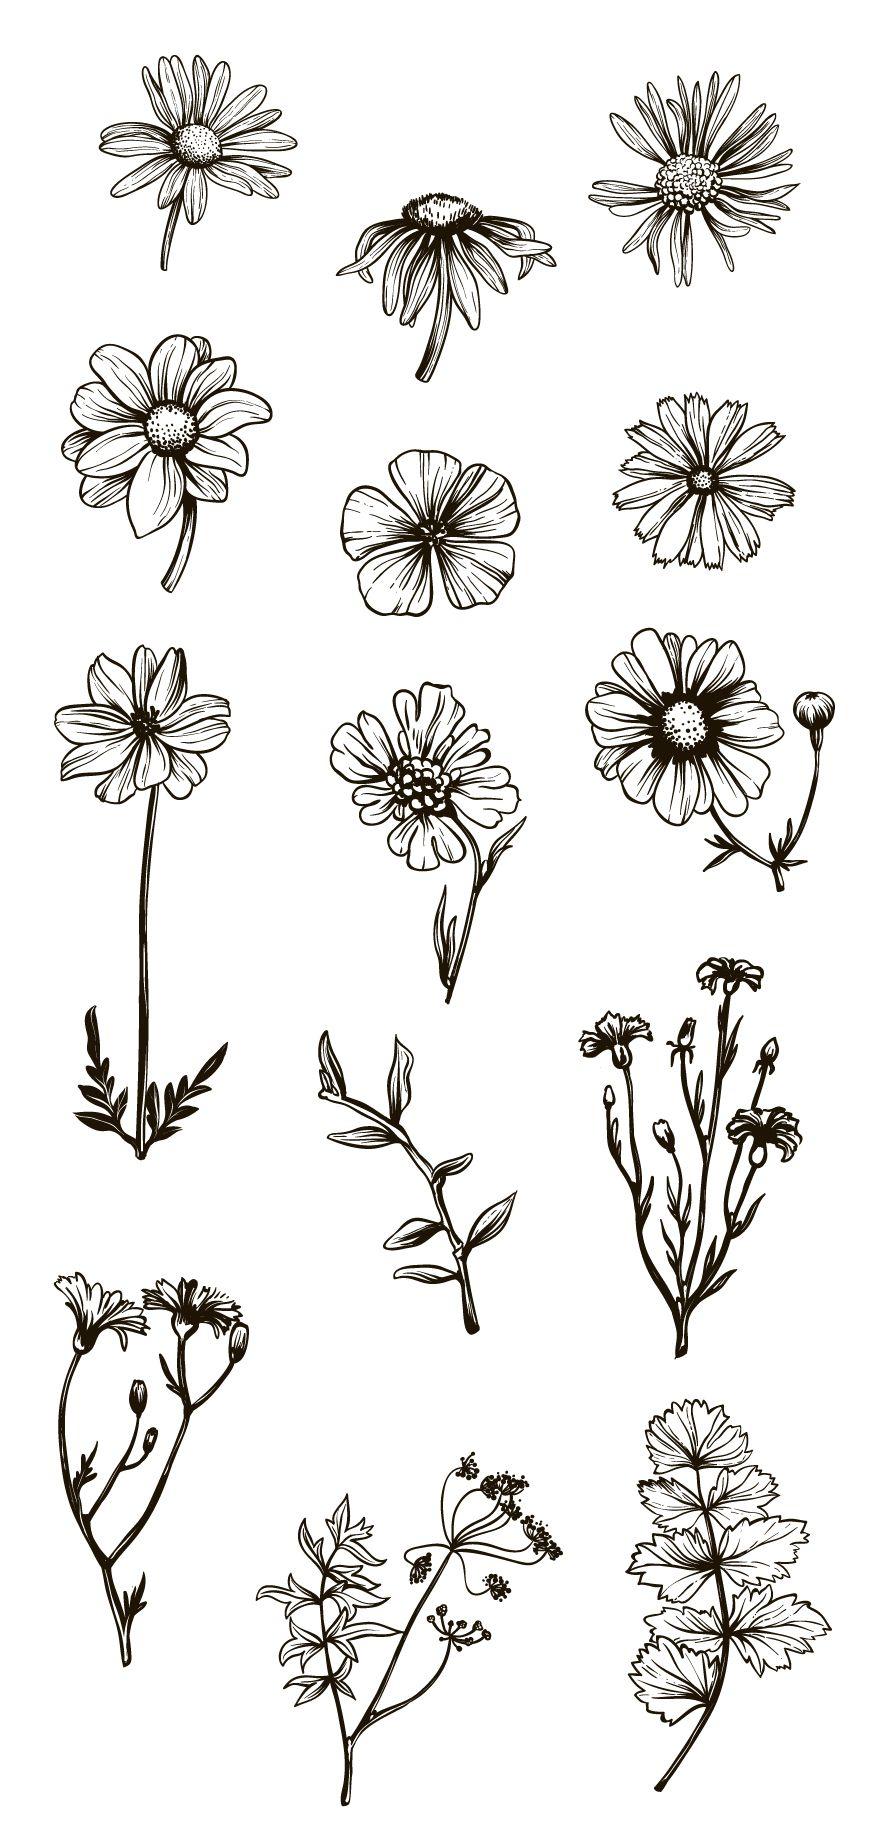 Vintage Flowers Herbs By Tatianacociorva On Creative Market Use